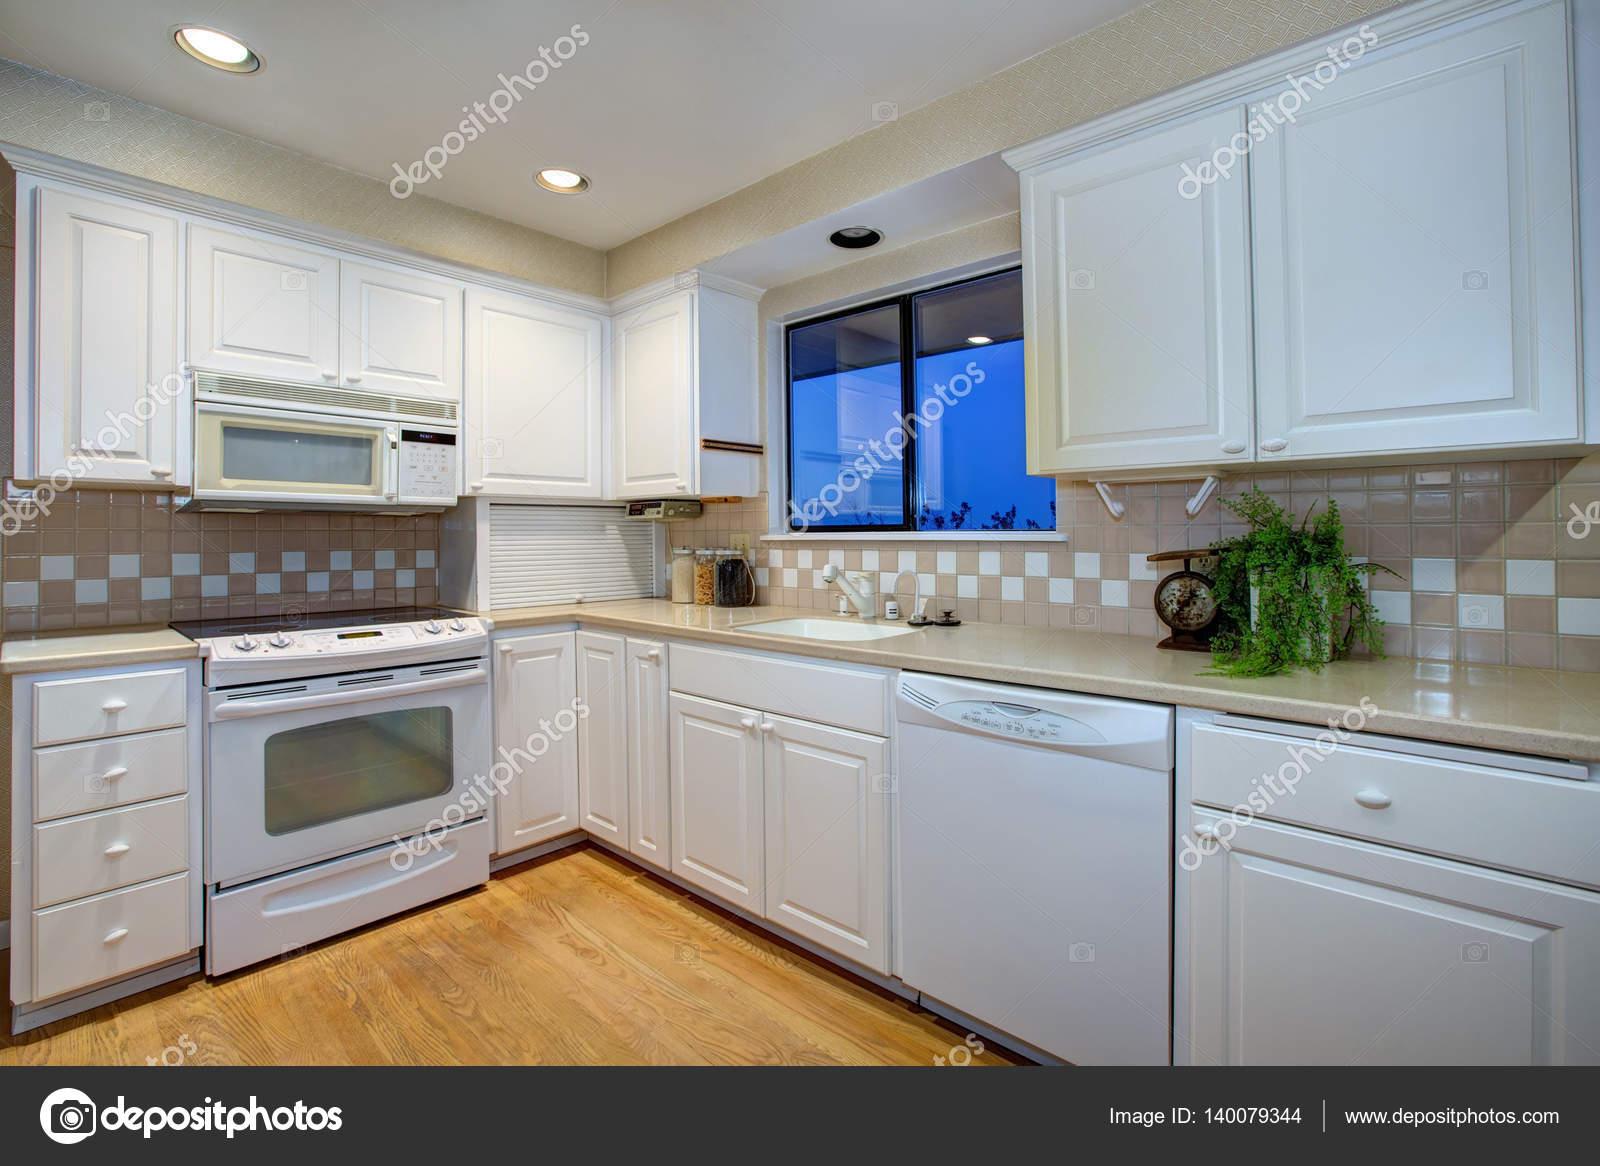 White Kitchen Design With Hardwood